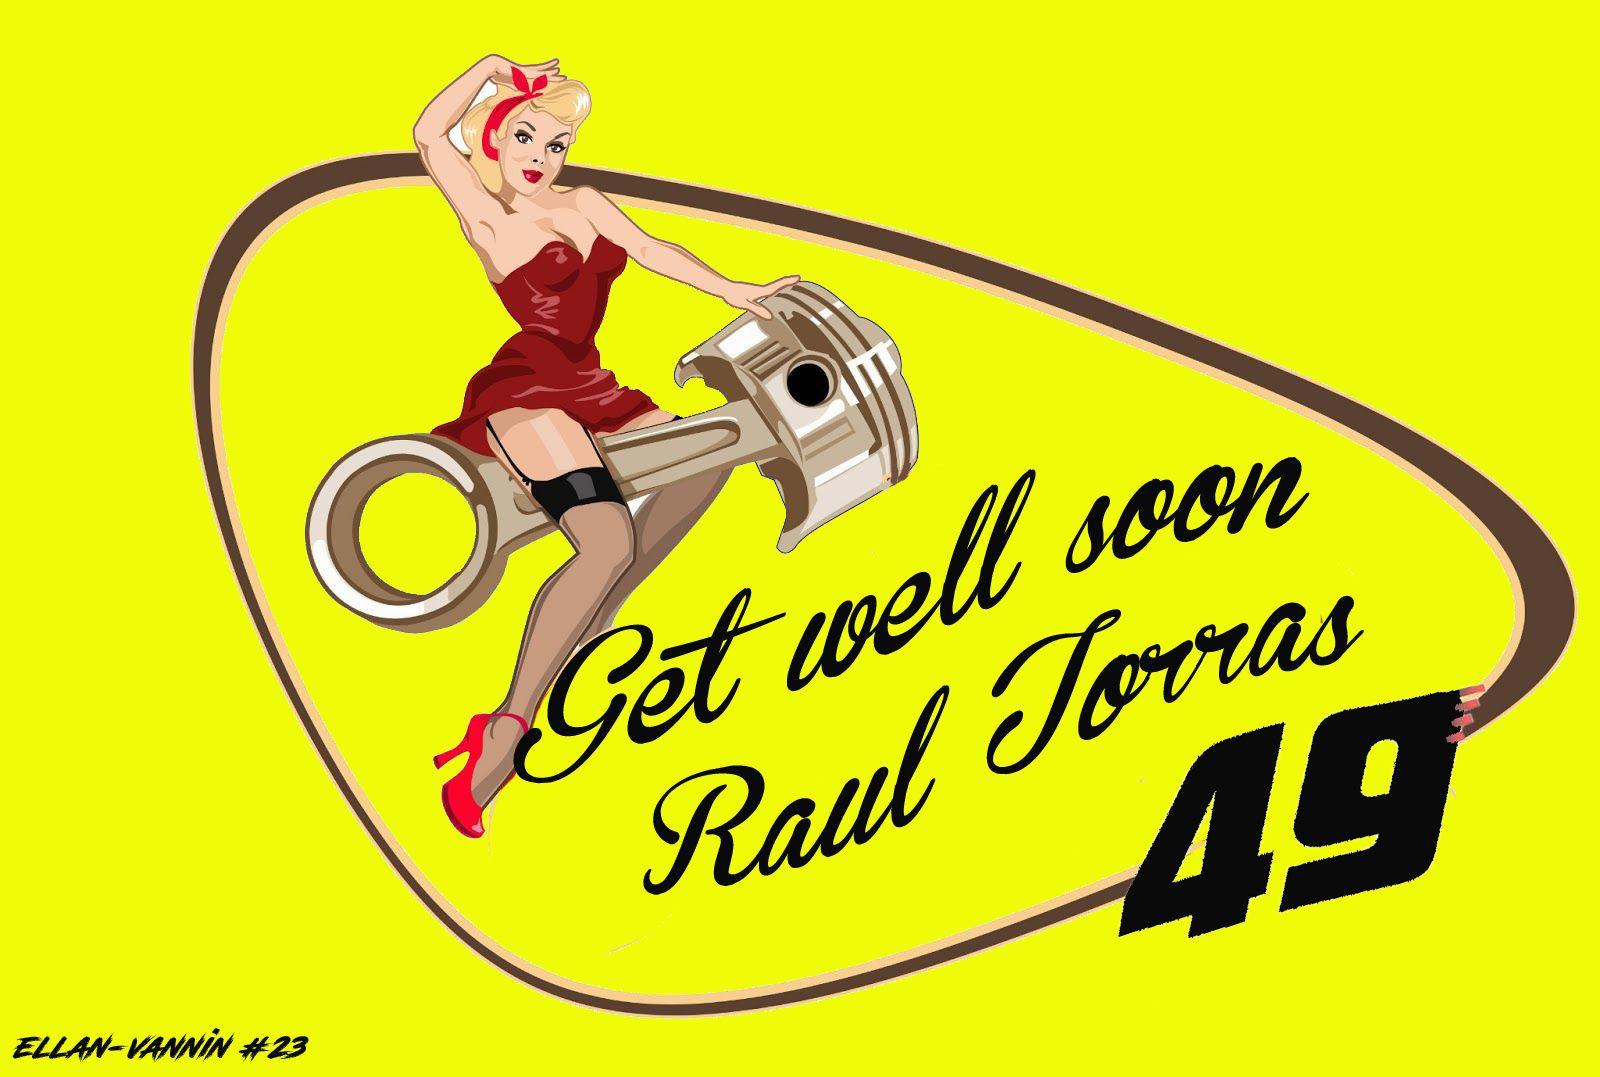 Get Well soon  Raul !!